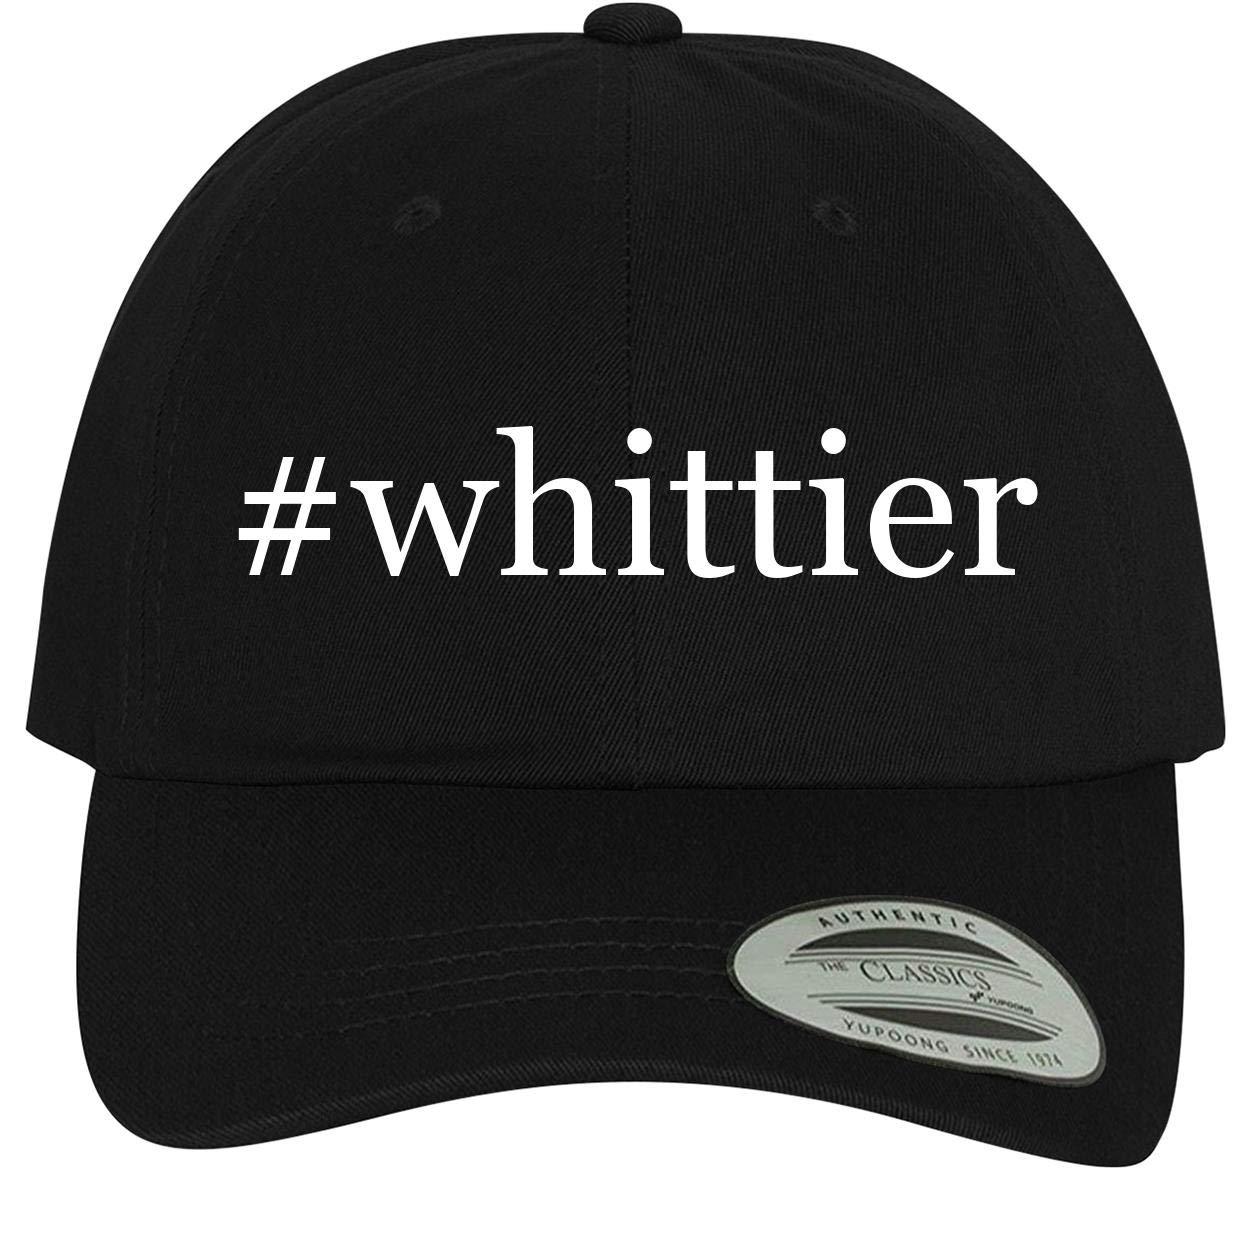 BH Cool Designs #Whittier Comfortable Dad Hat Baseball Cap